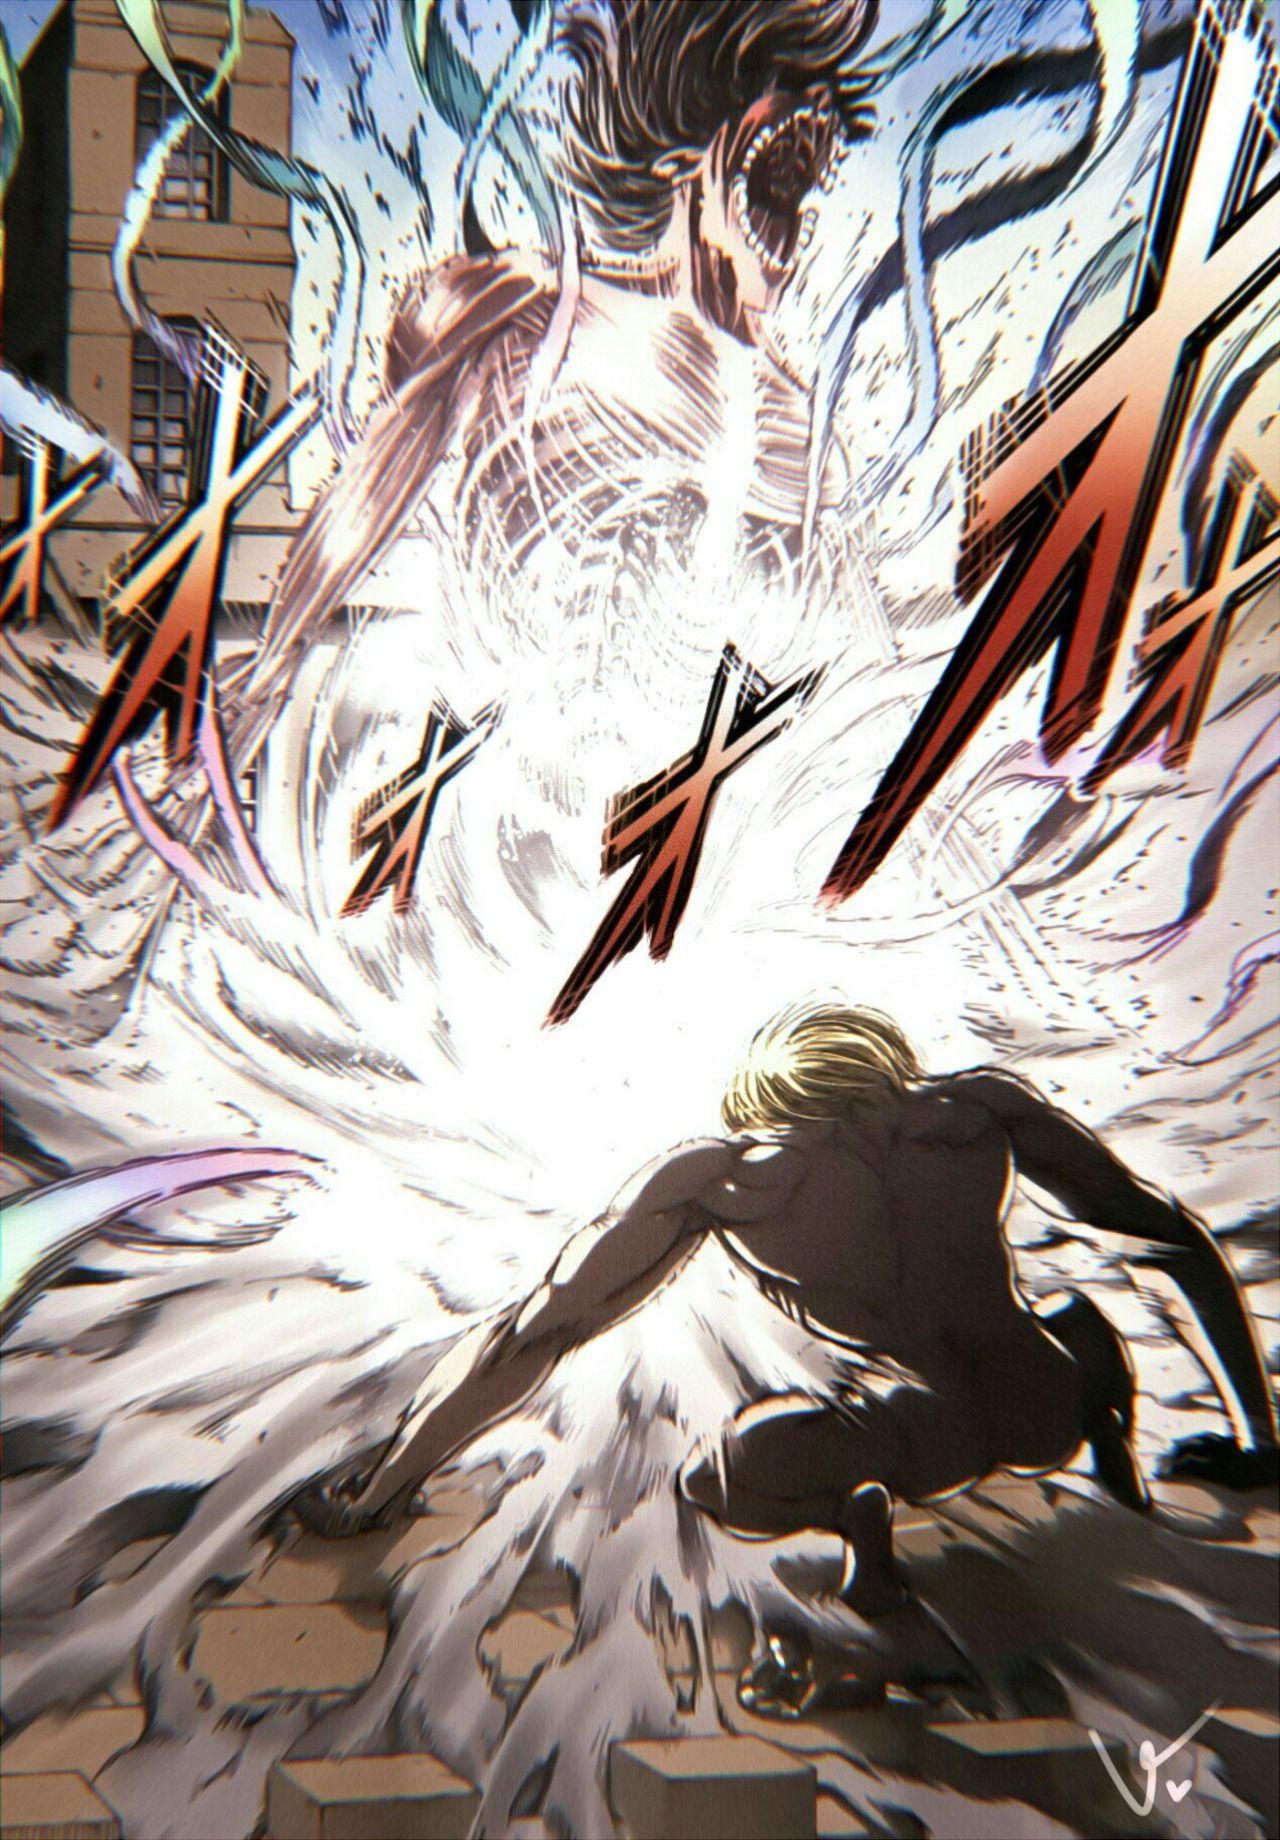 Attack on Titan Chapter 116 Attack on titan fanart